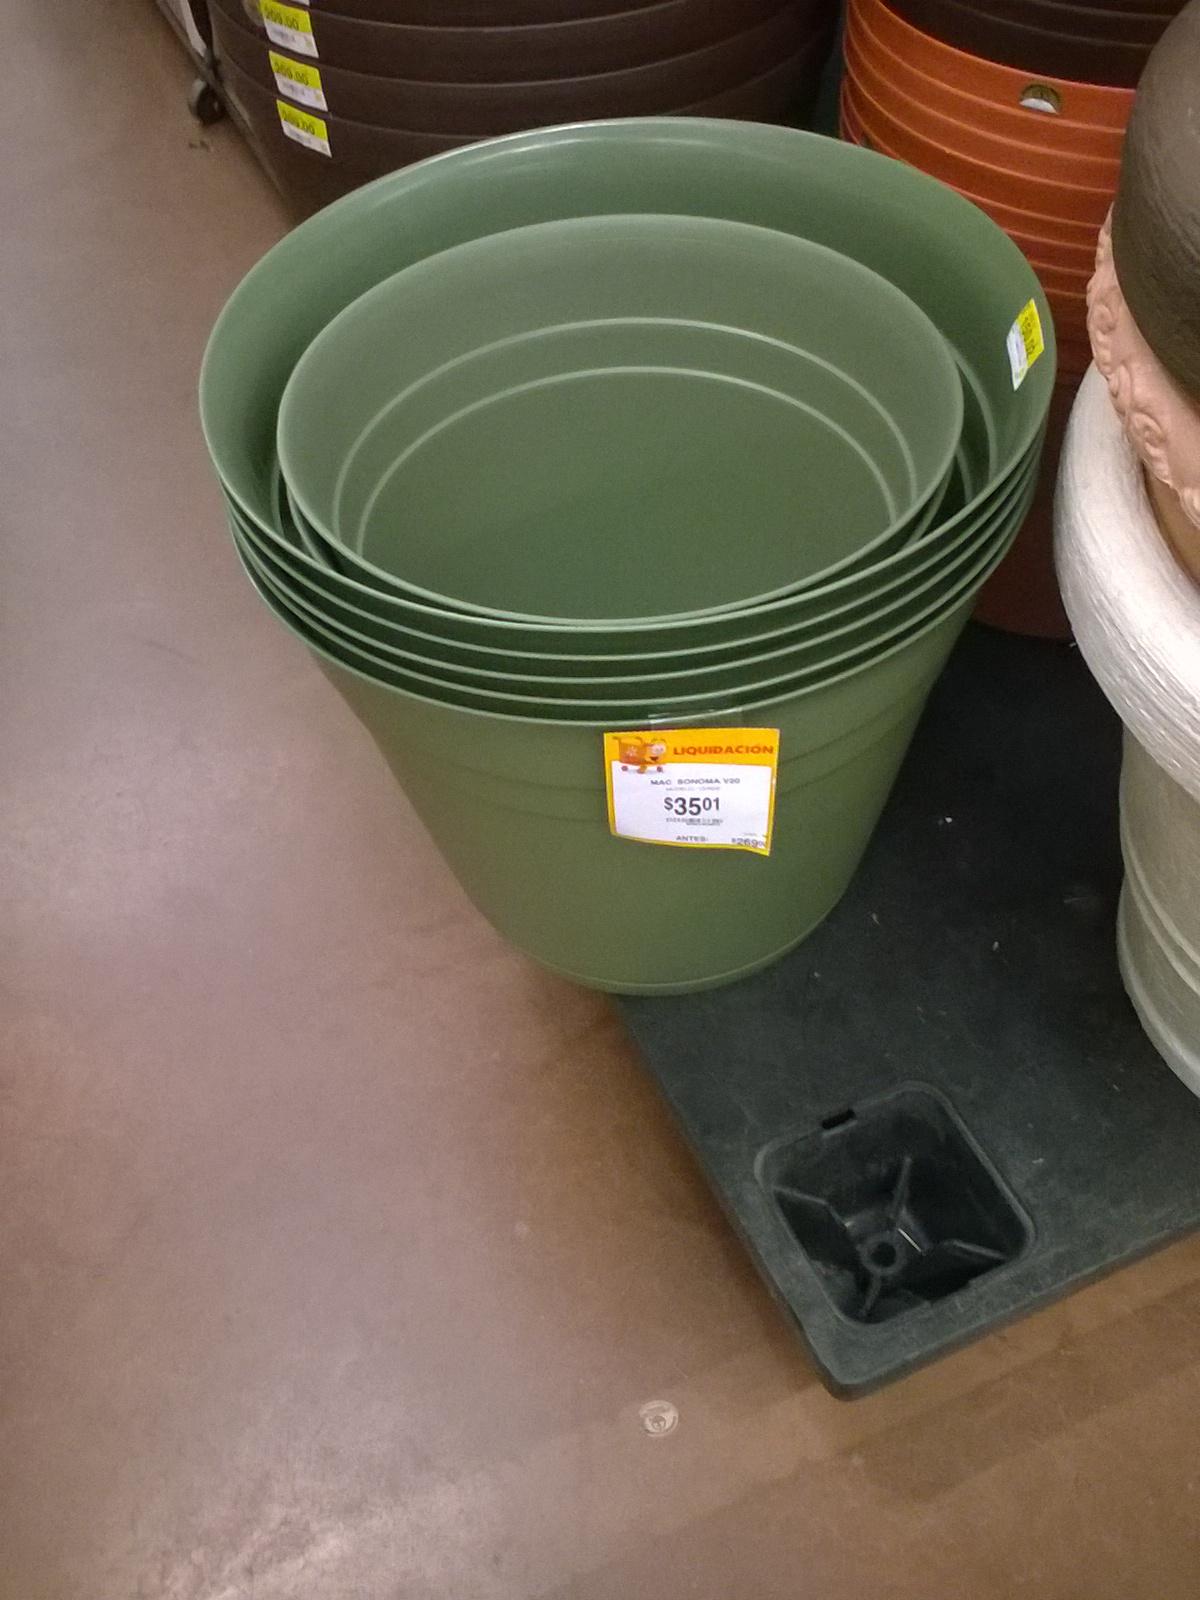 Walmart carrizal Vhsa: Maceta Jumbo a $35.01 y mas